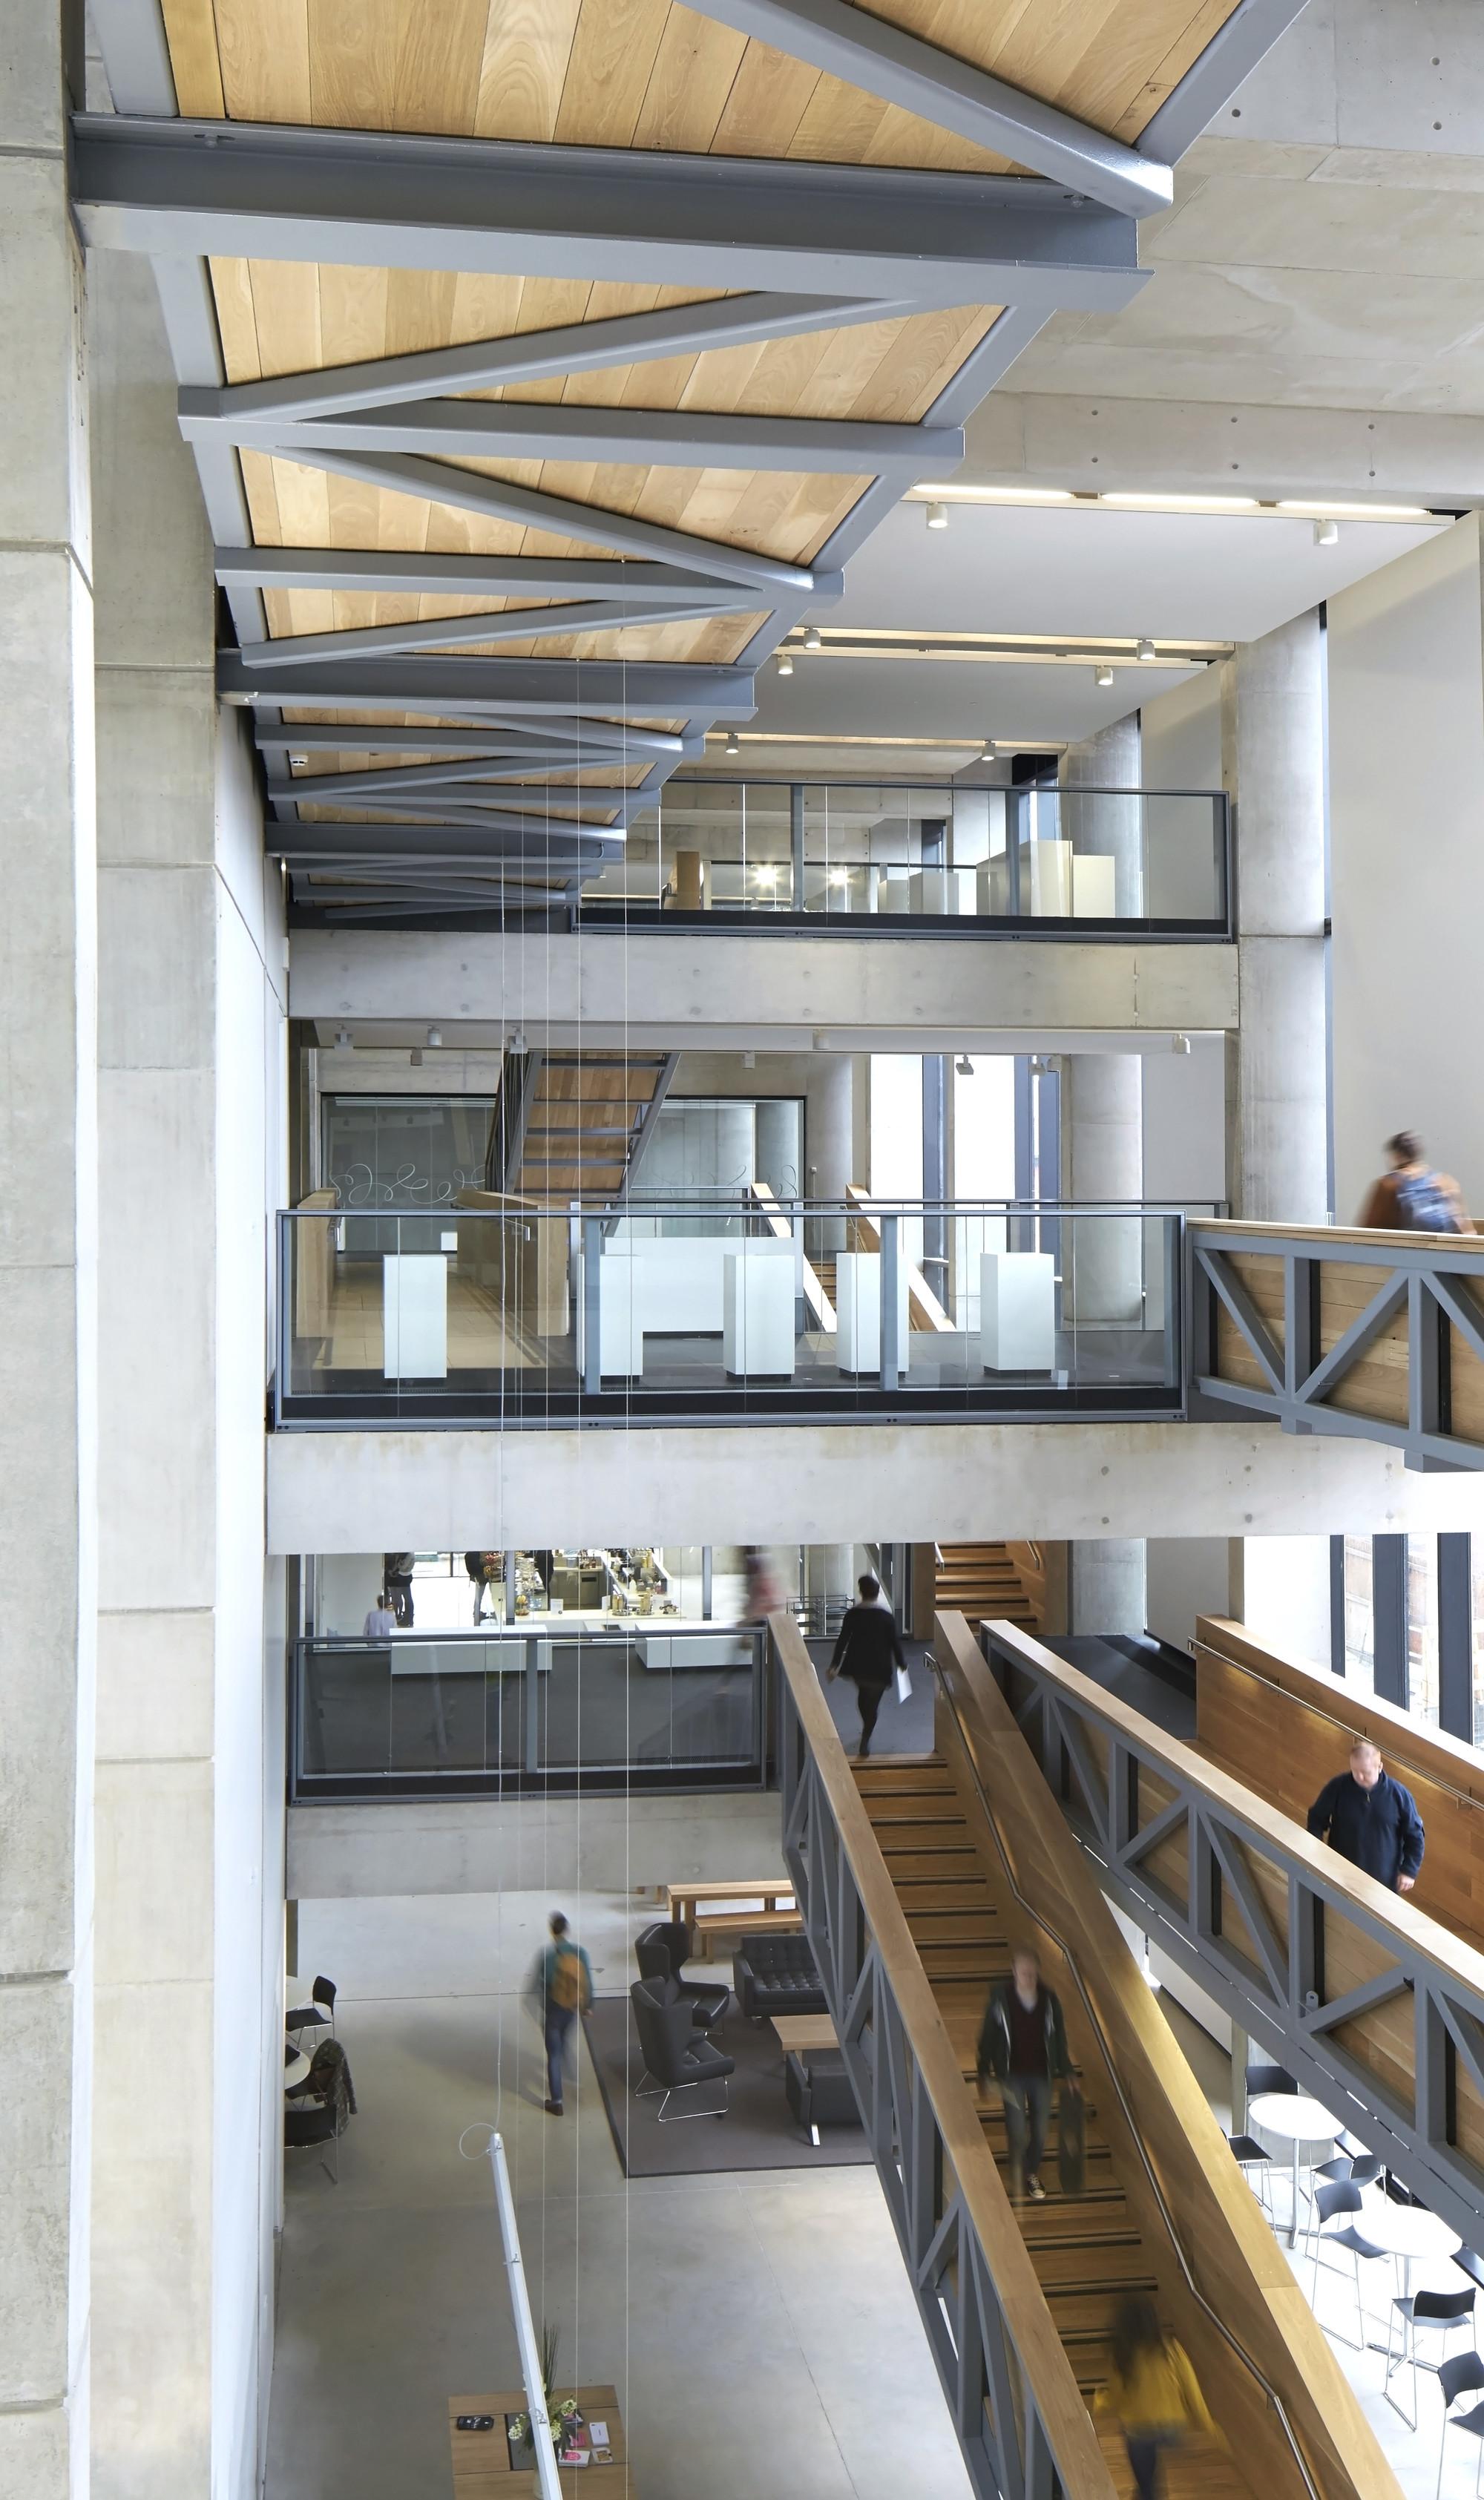 Art Gallery Interior Design Concept Description